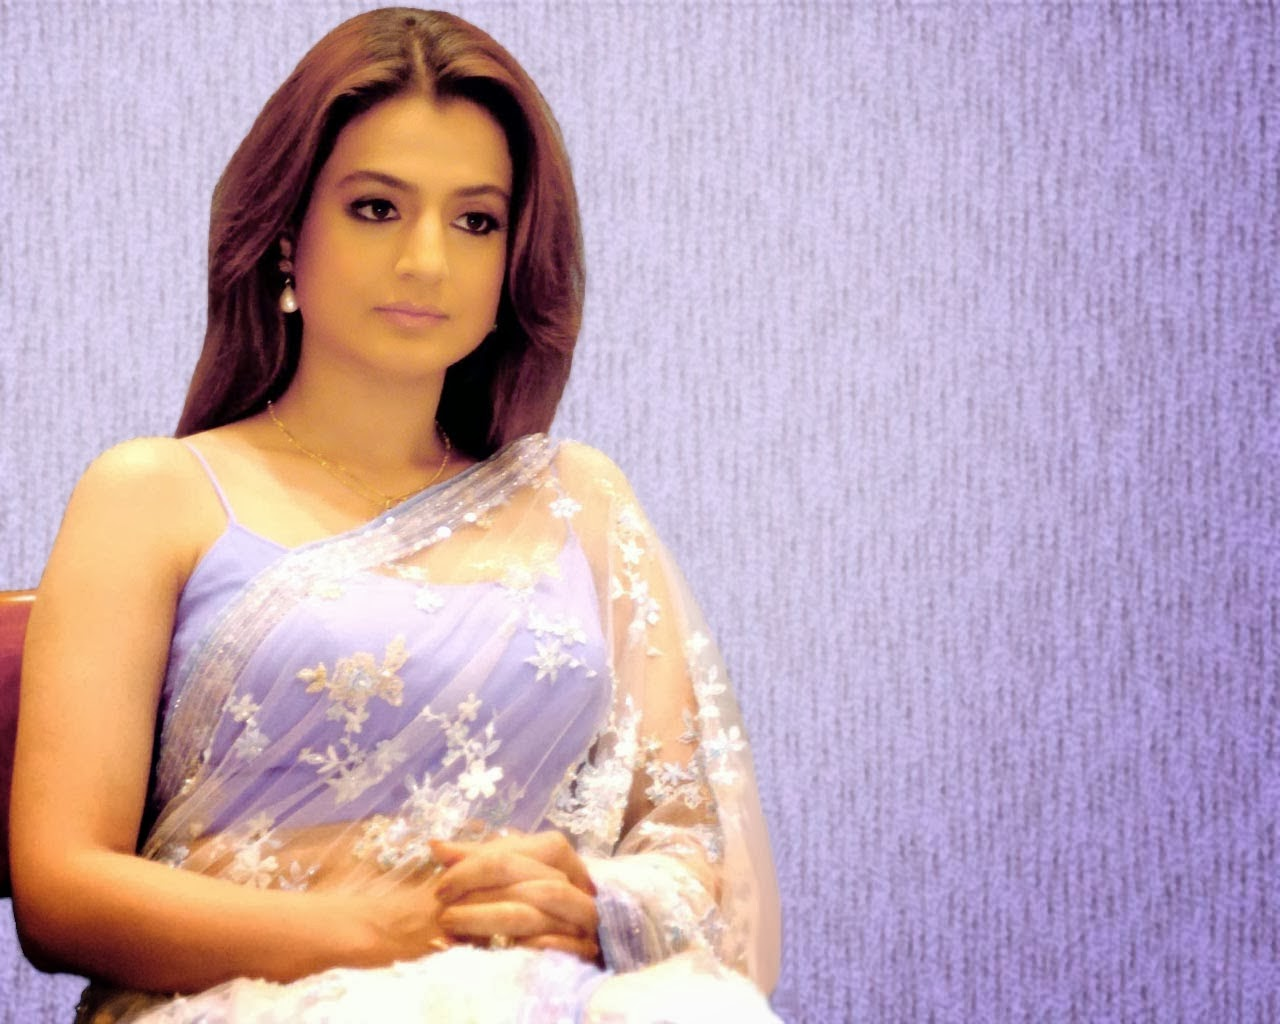 Ameesha Patel Hot Videos free download amisha patel hot hd wallpapers download unique